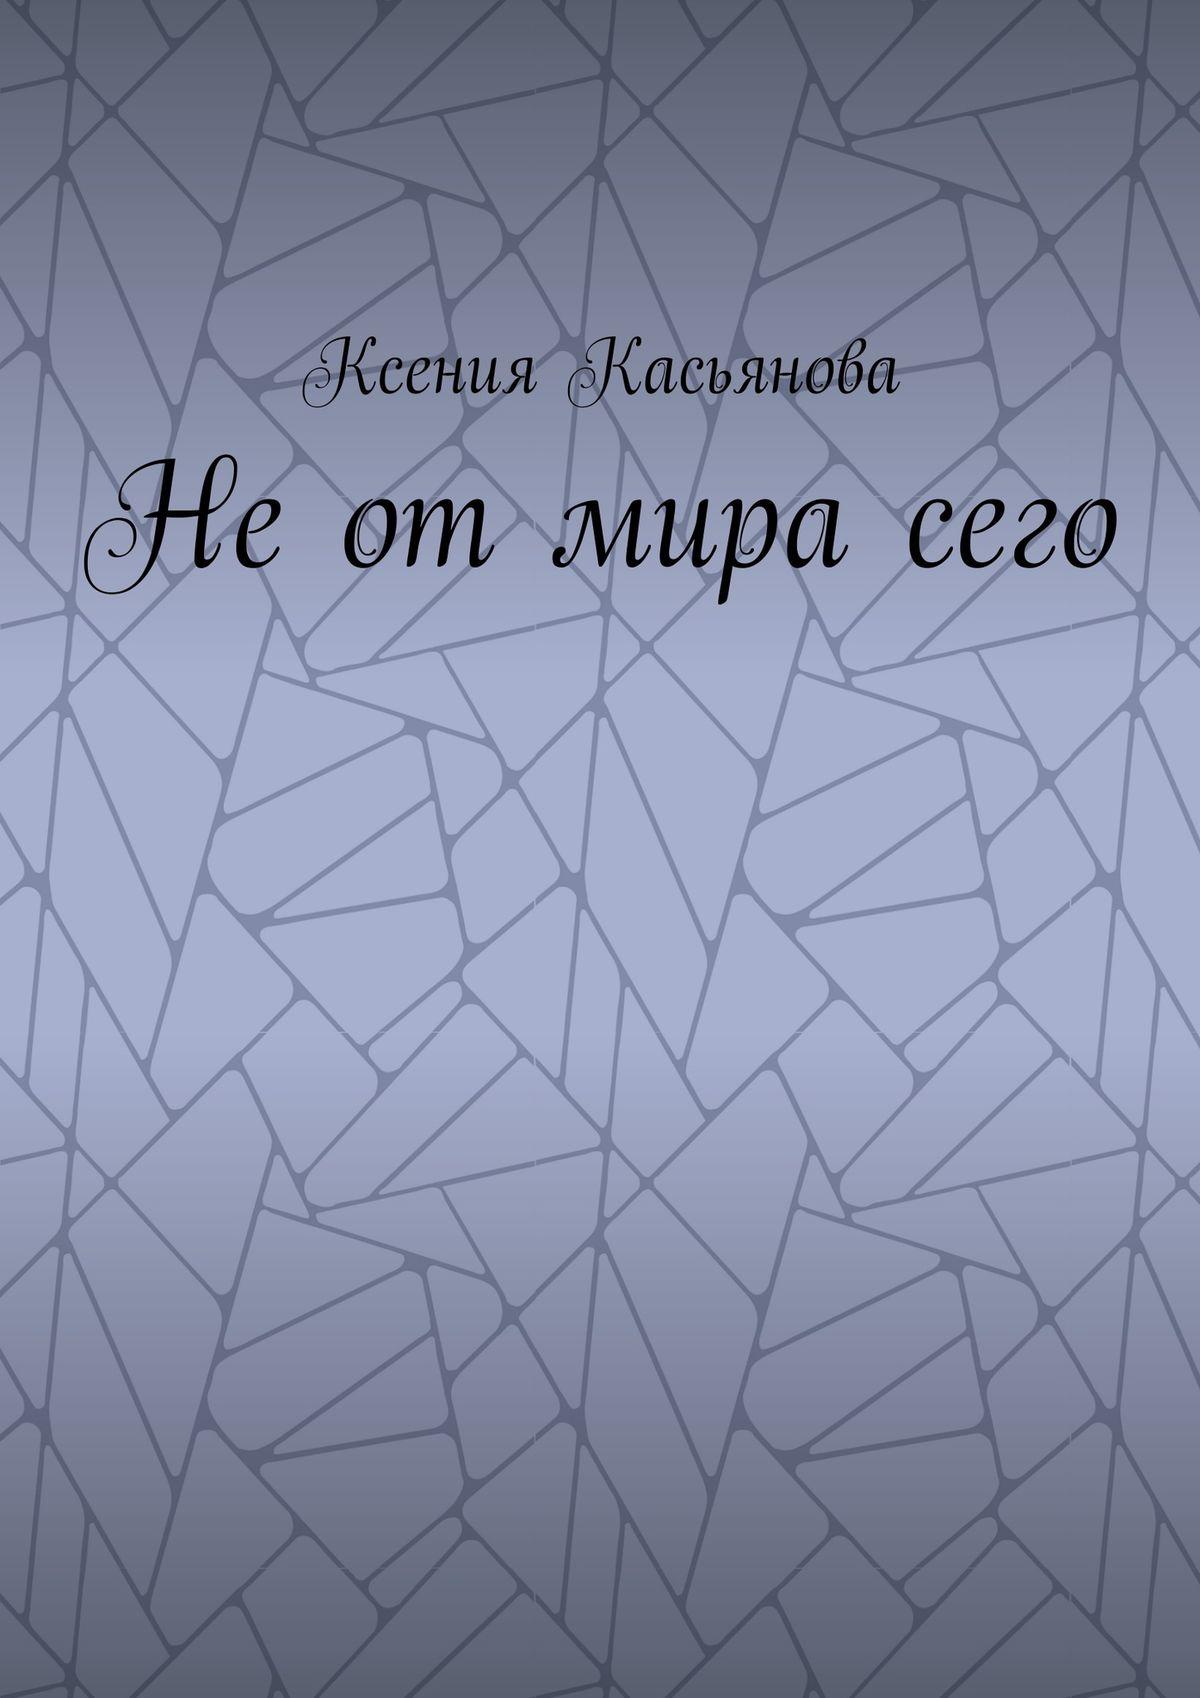 Ксения Викторовна Касьянова Неотмирасего